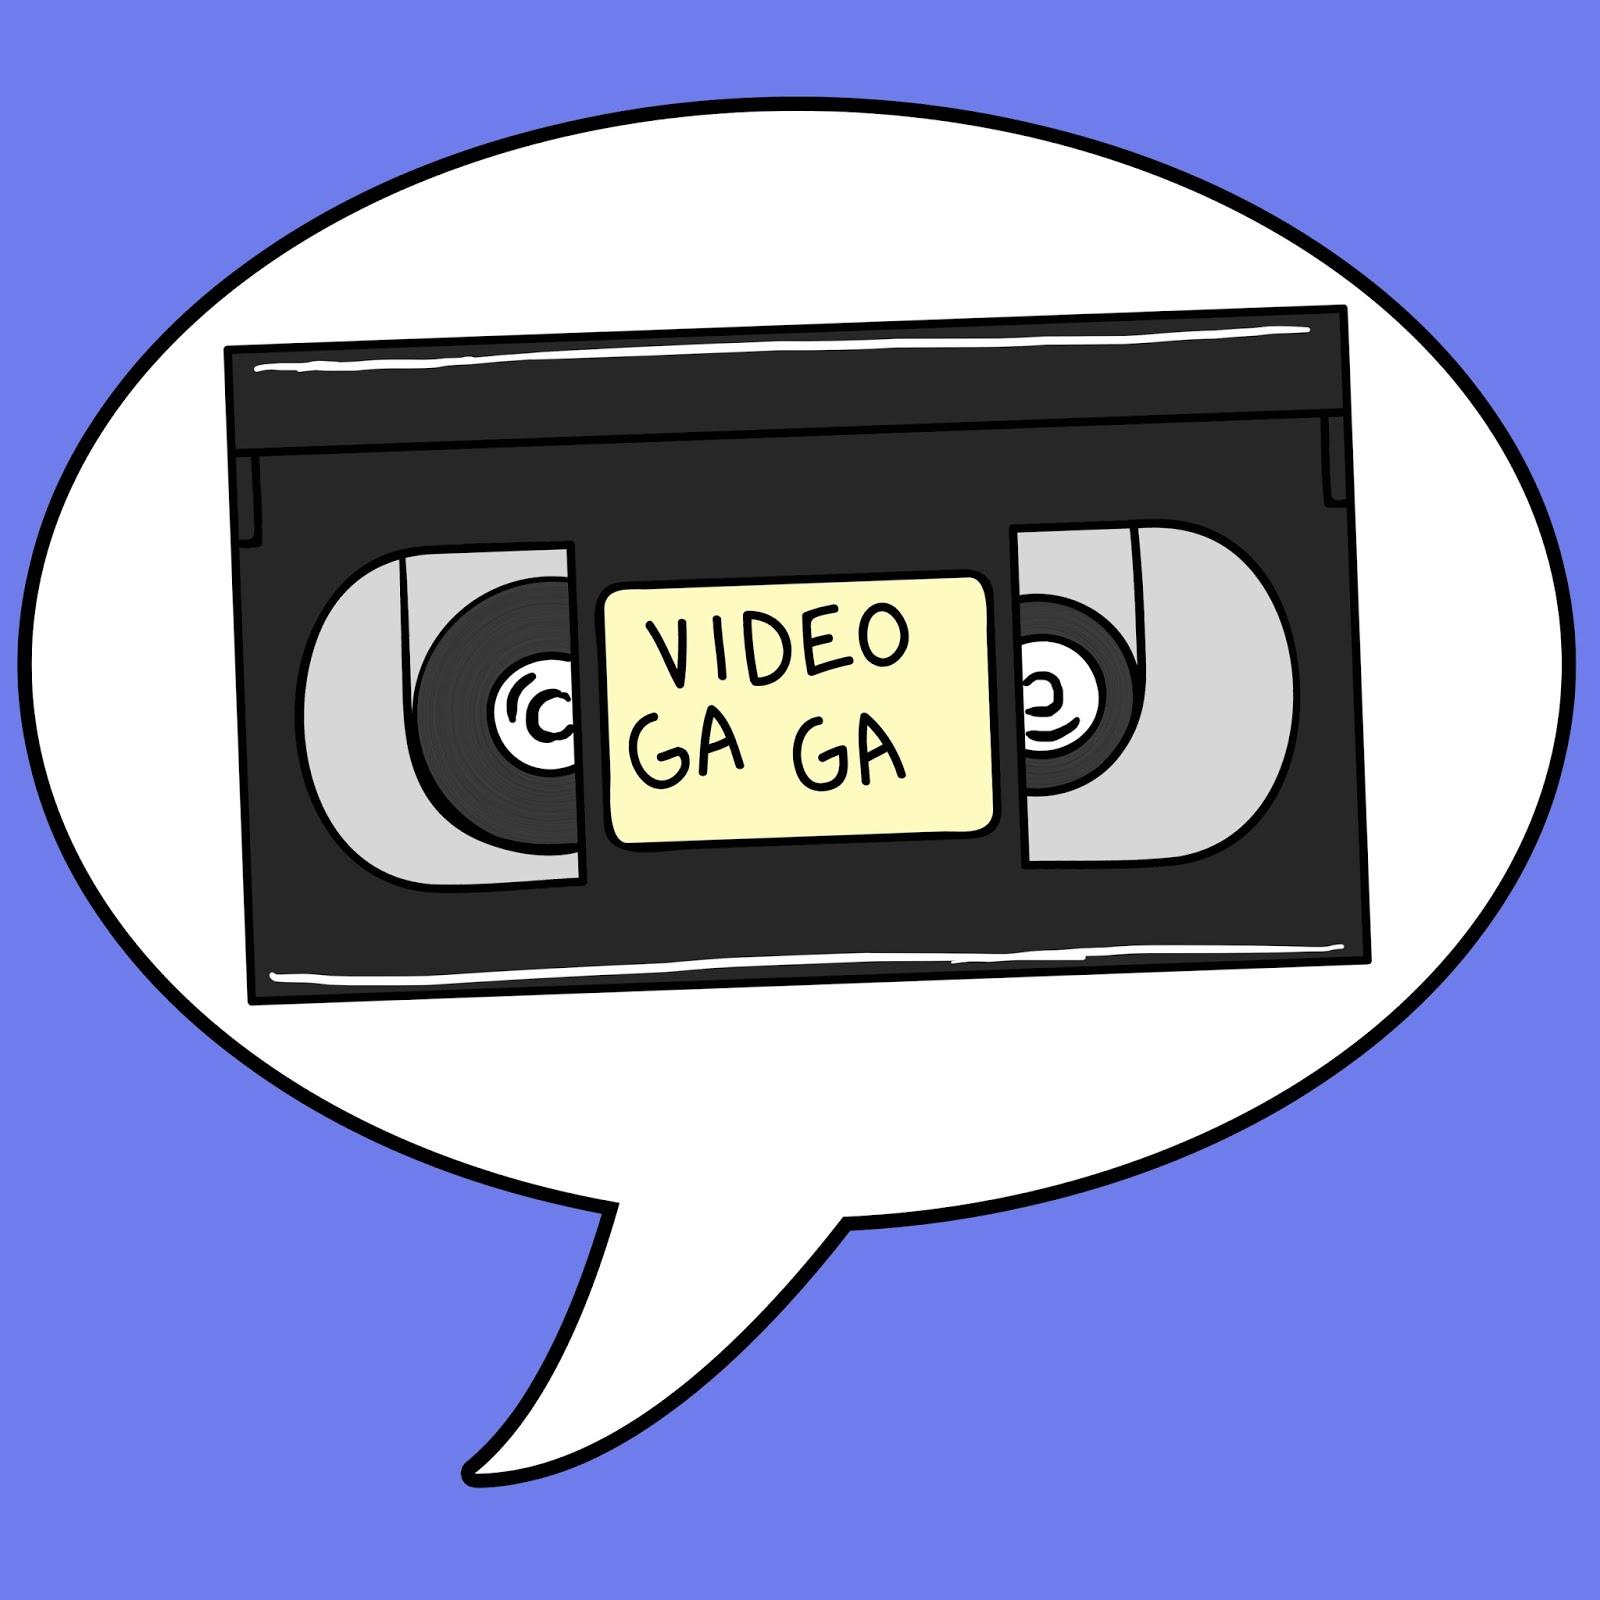 Video Ga Ga: Ep 2: Gorillaz - Dirty Harry